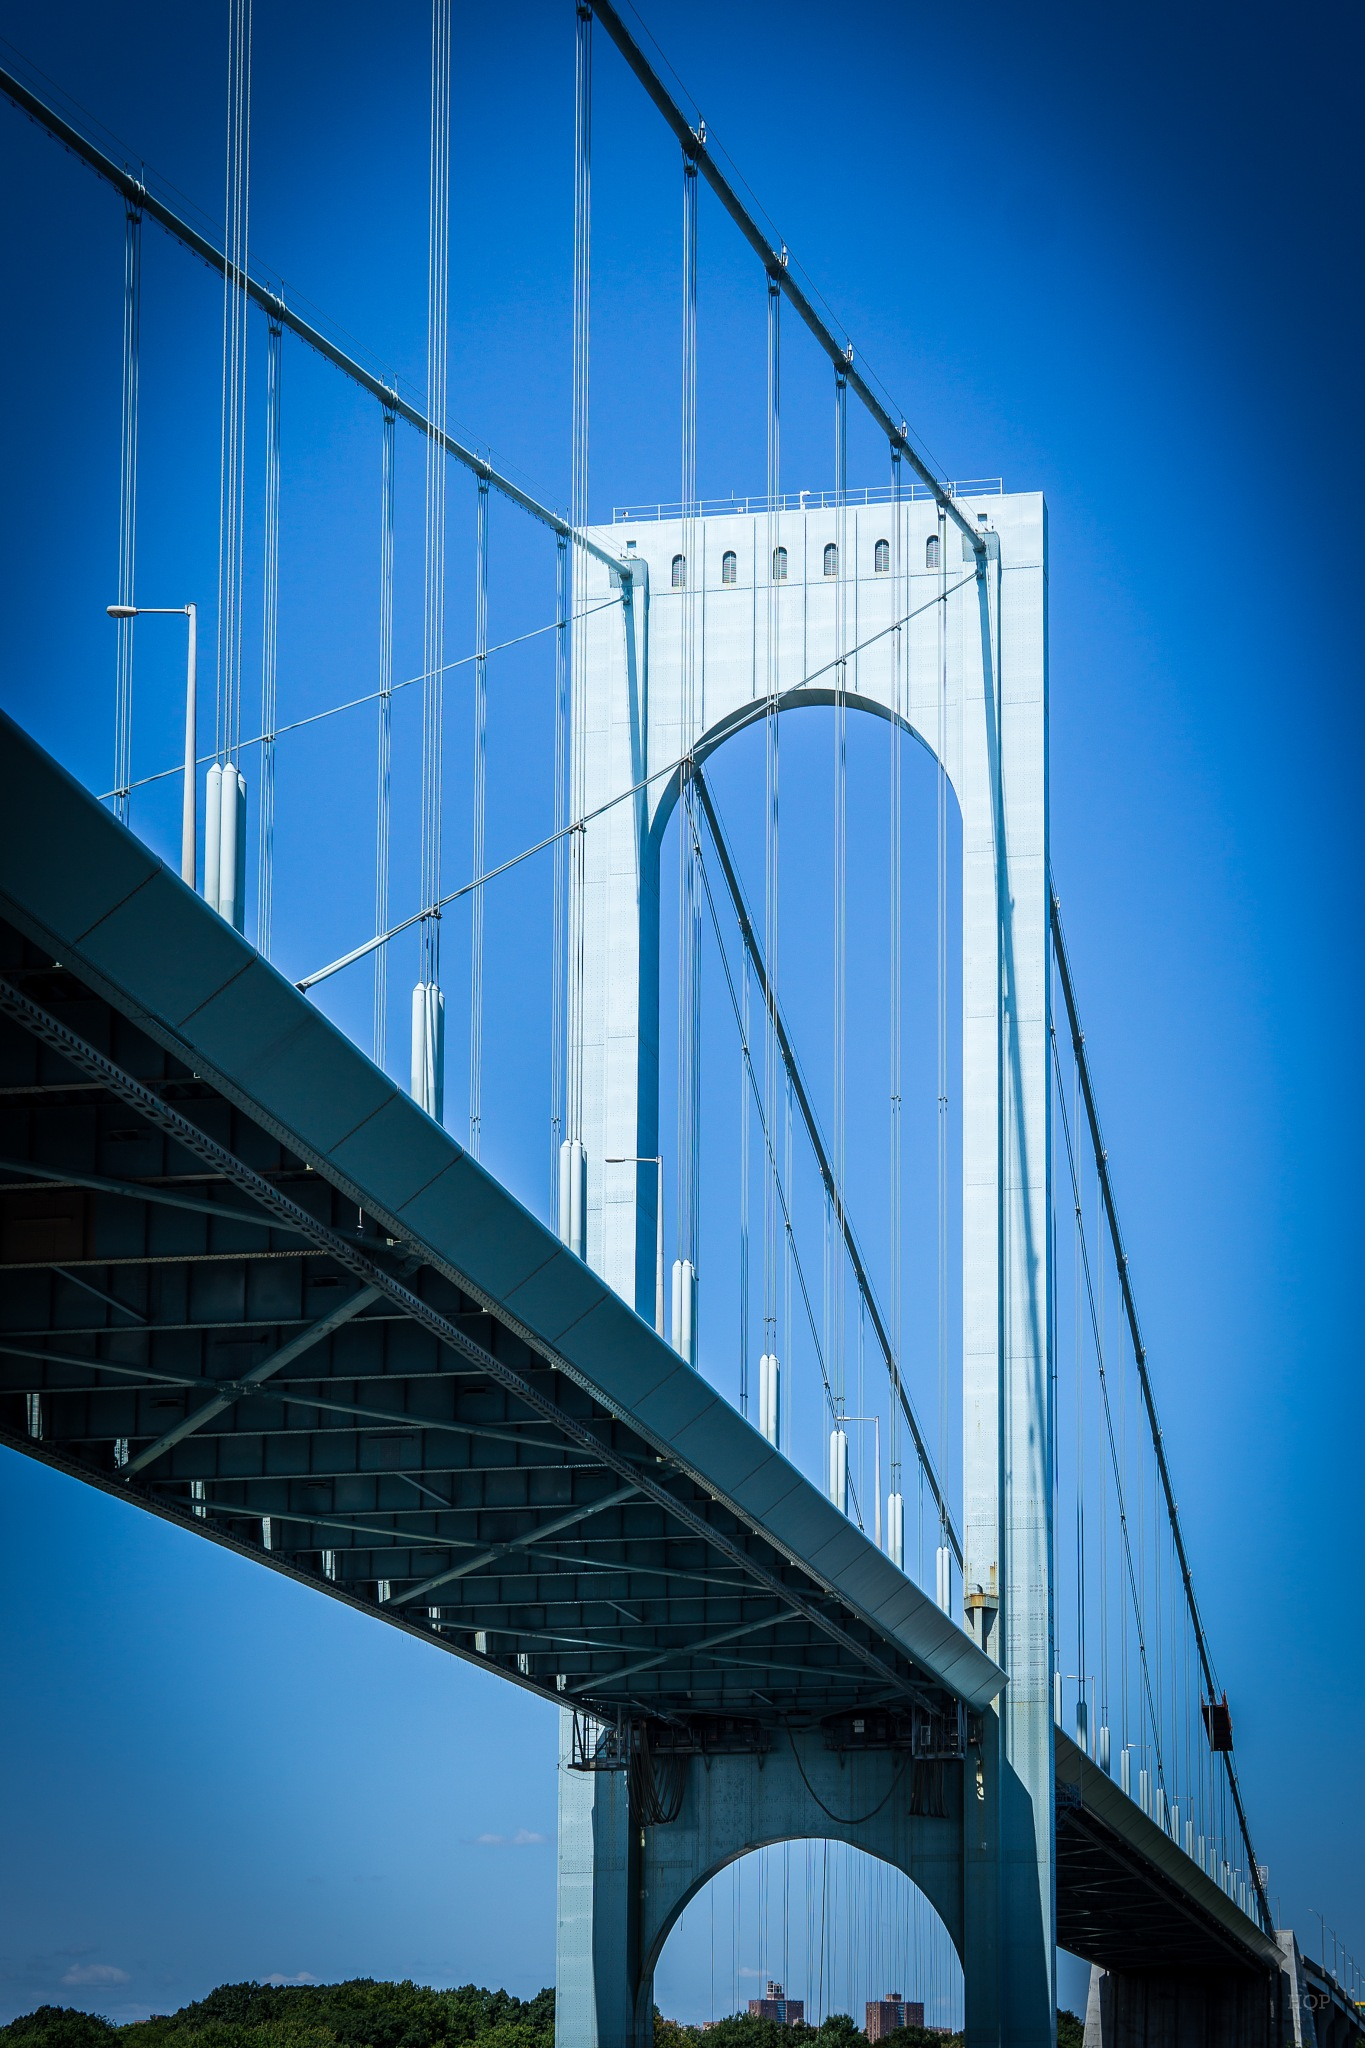 Bridgework by Tom P.